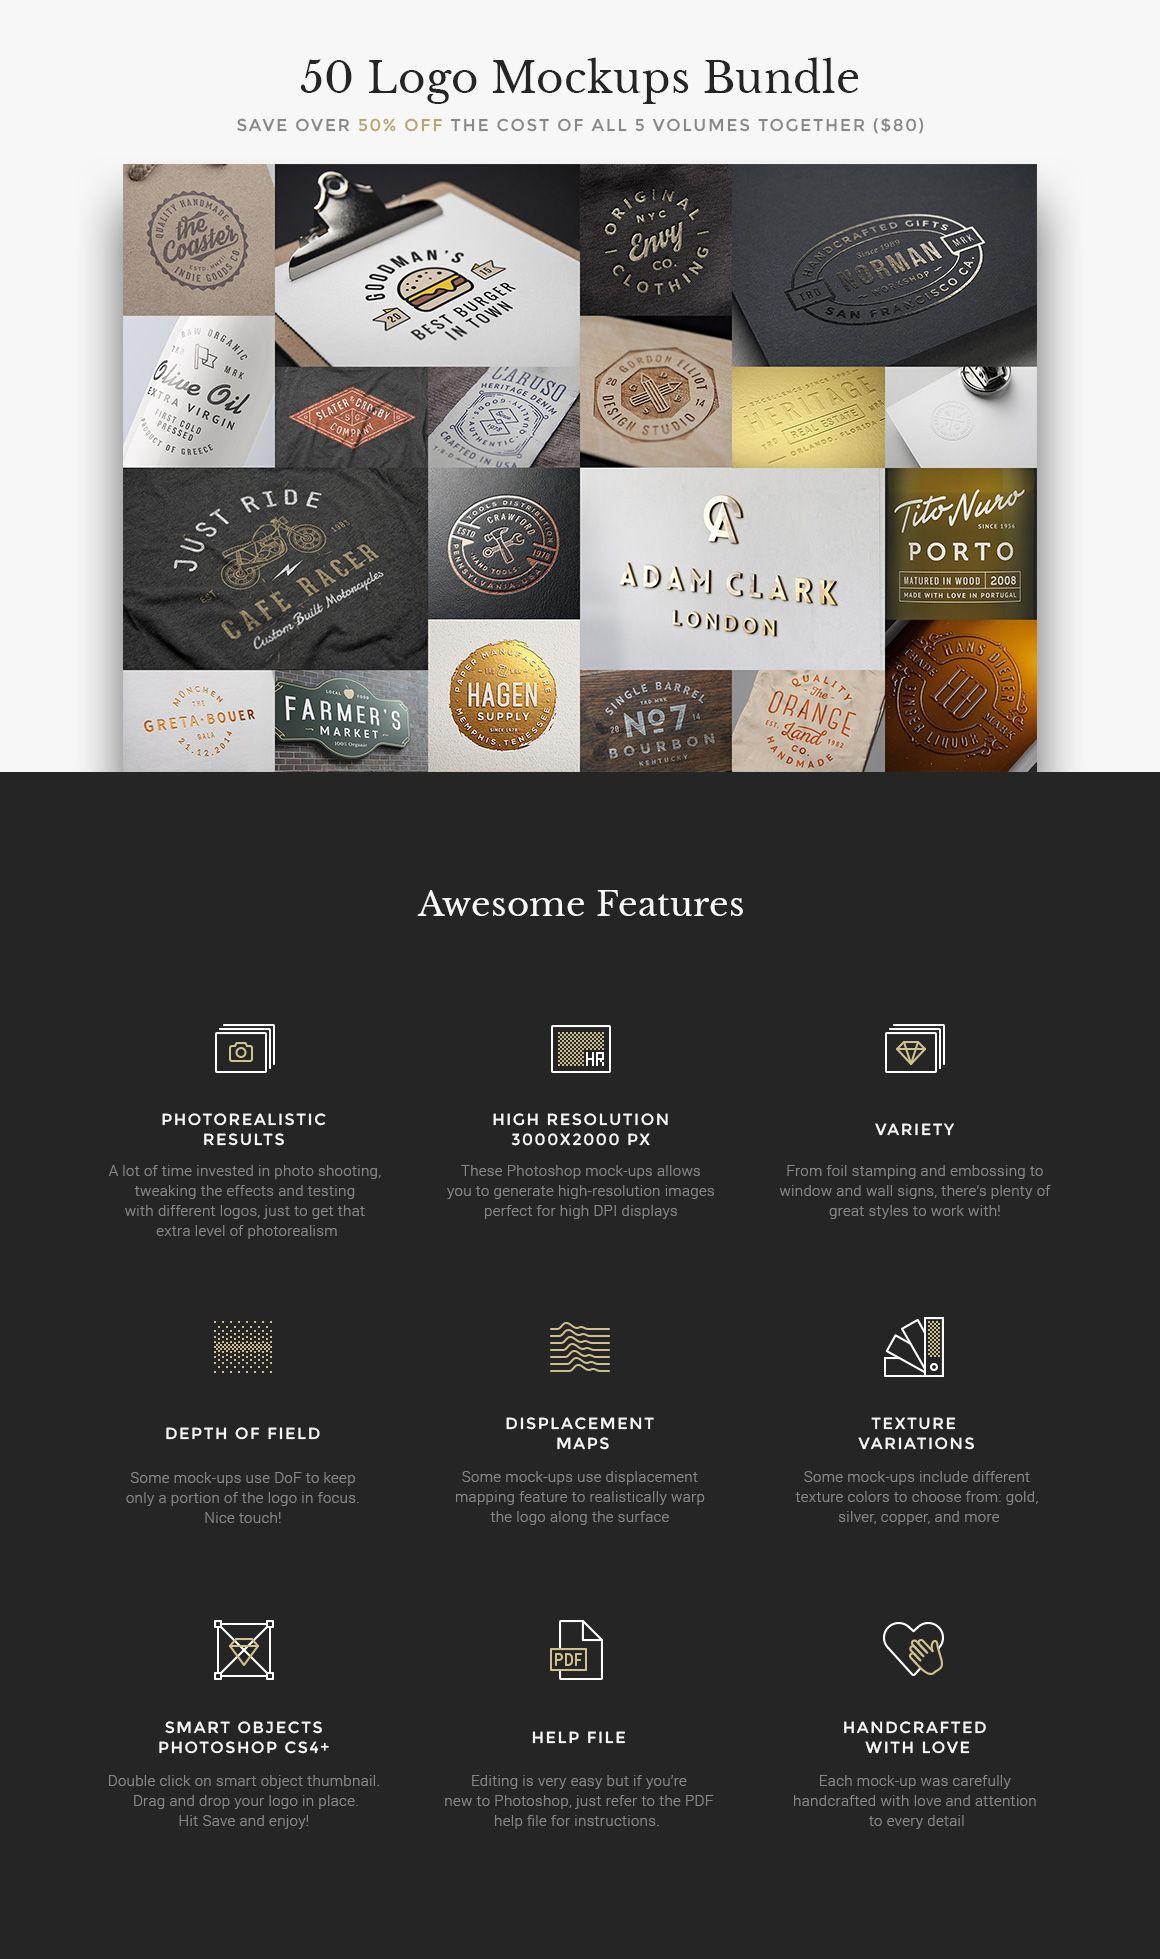 50 Logo Mock-Ups Bundle - Product Mockups - 1 | [us] | Pinterest ...